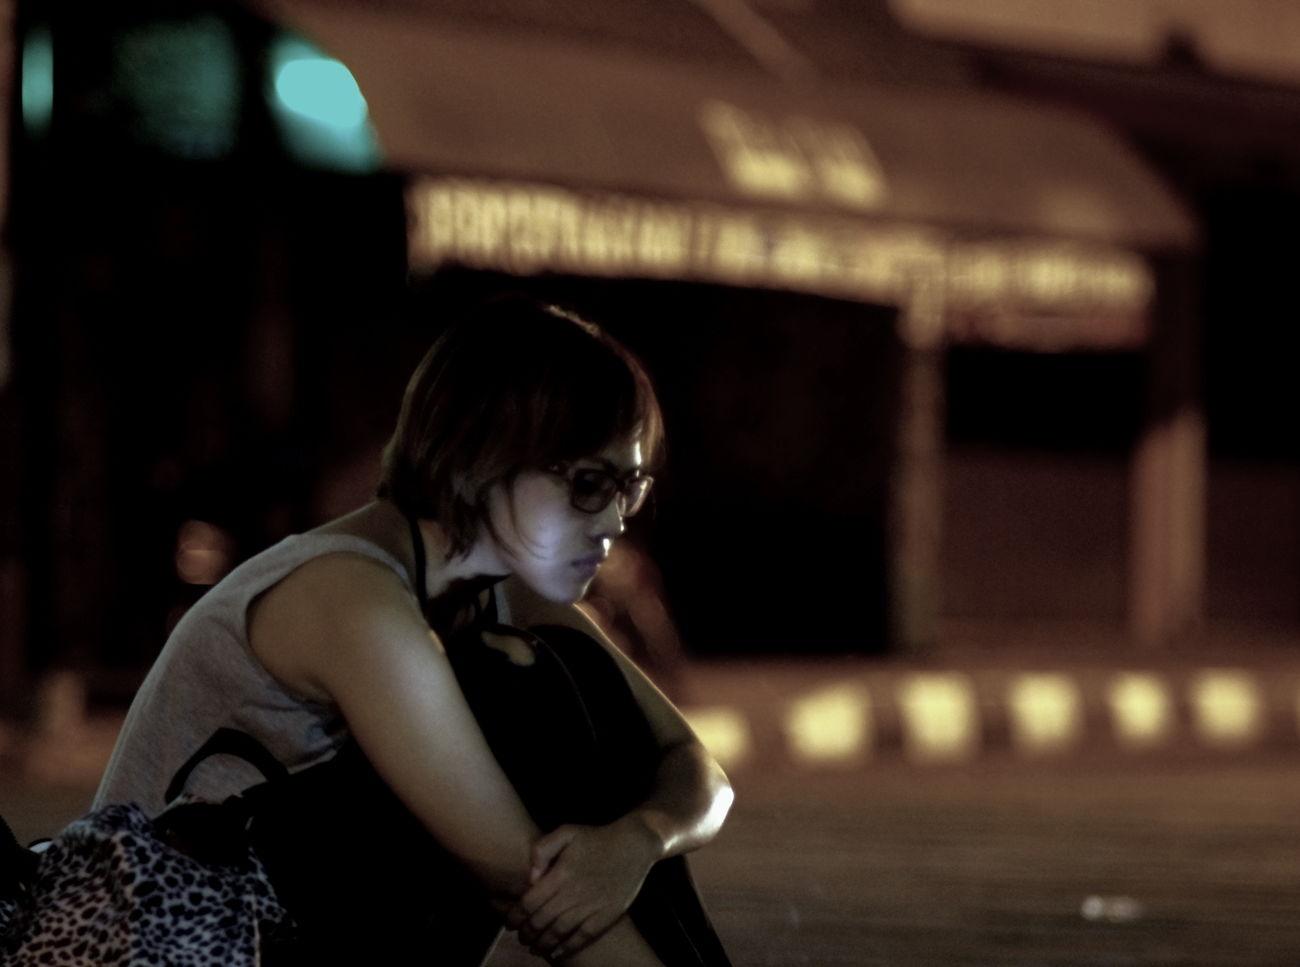 The EyeEm Facebook Cover Challenge Streetphotography AStudioMakeUp Mood Photo